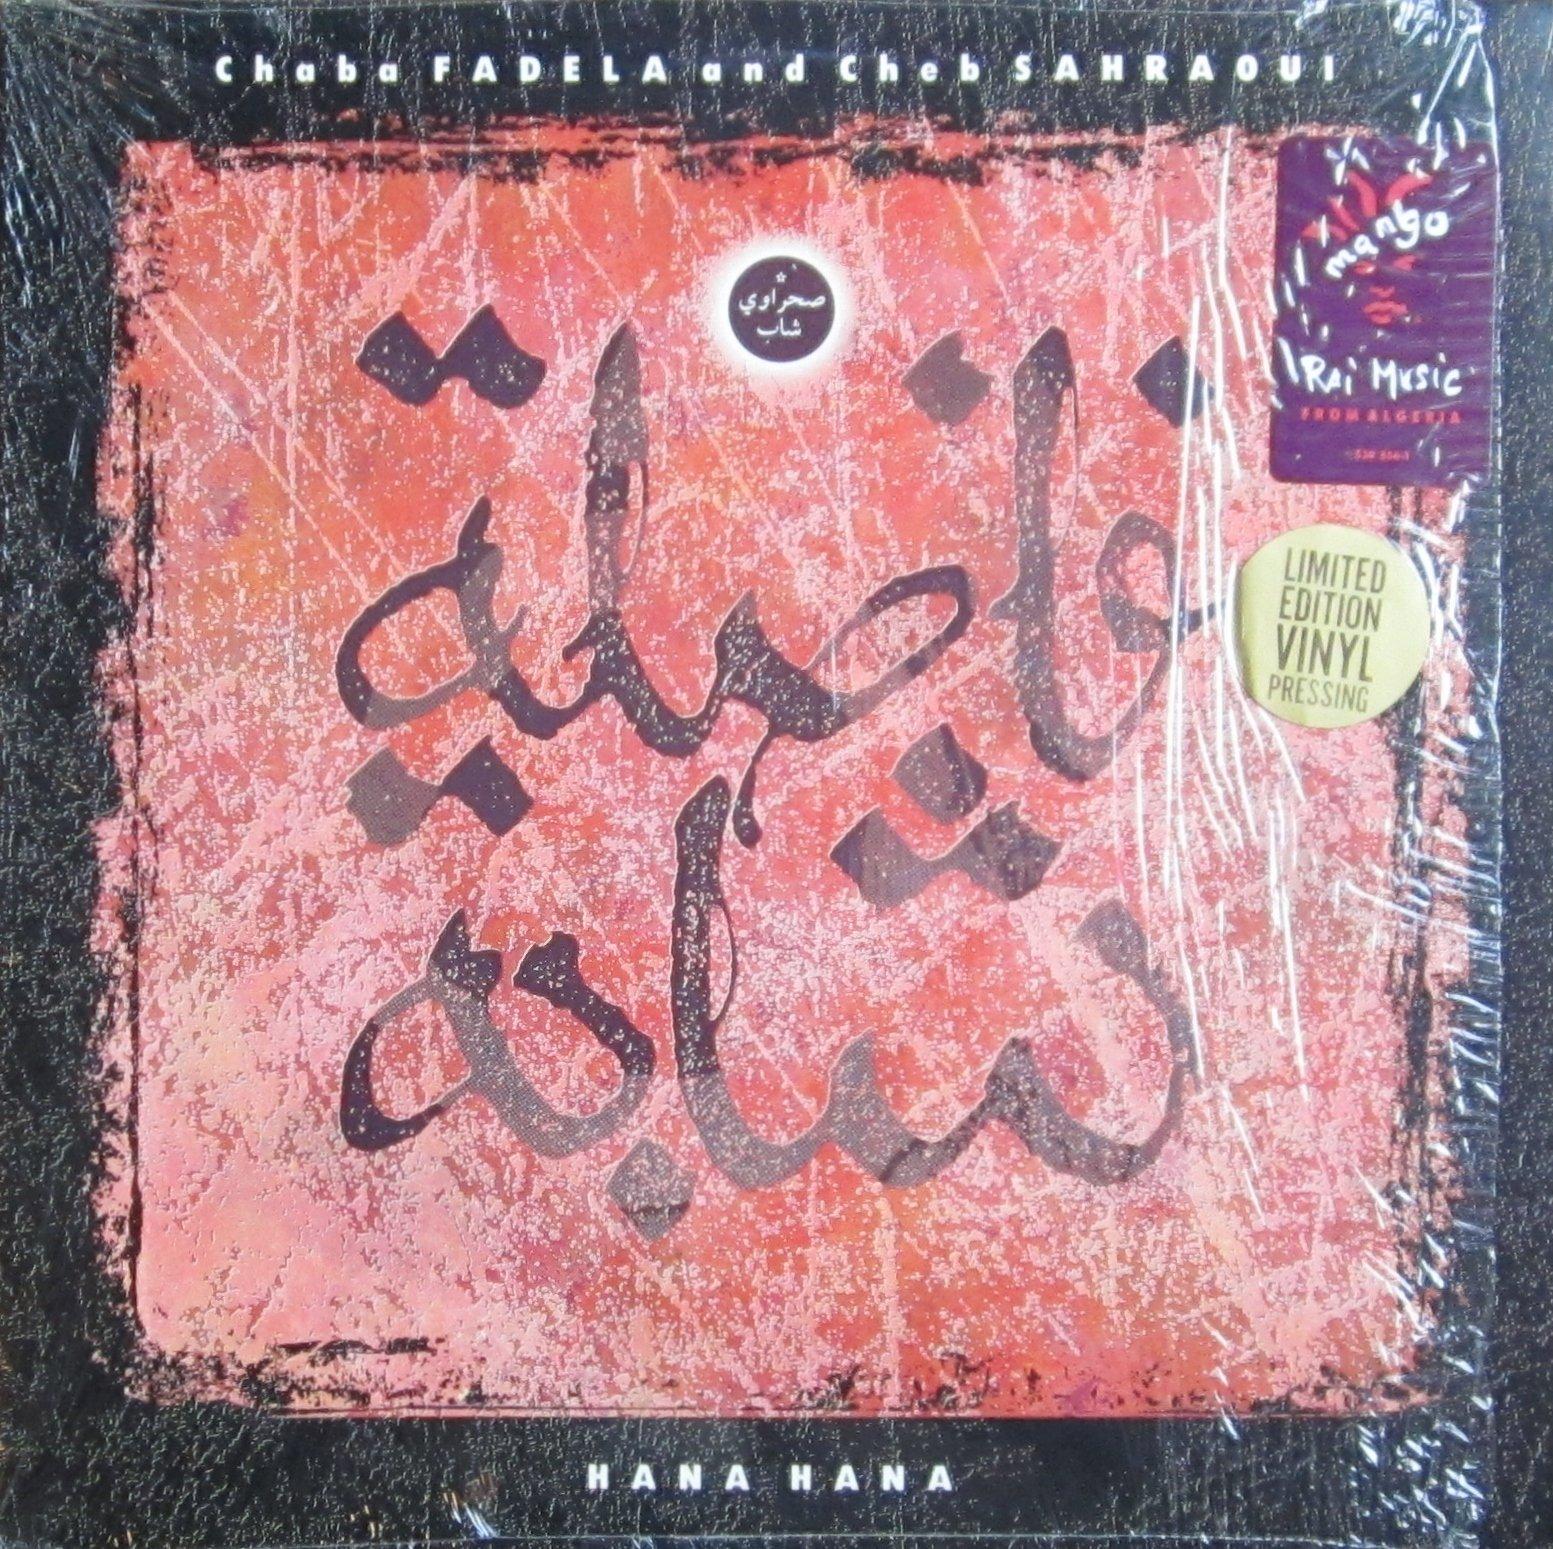 Hana Hana [Vinyl]